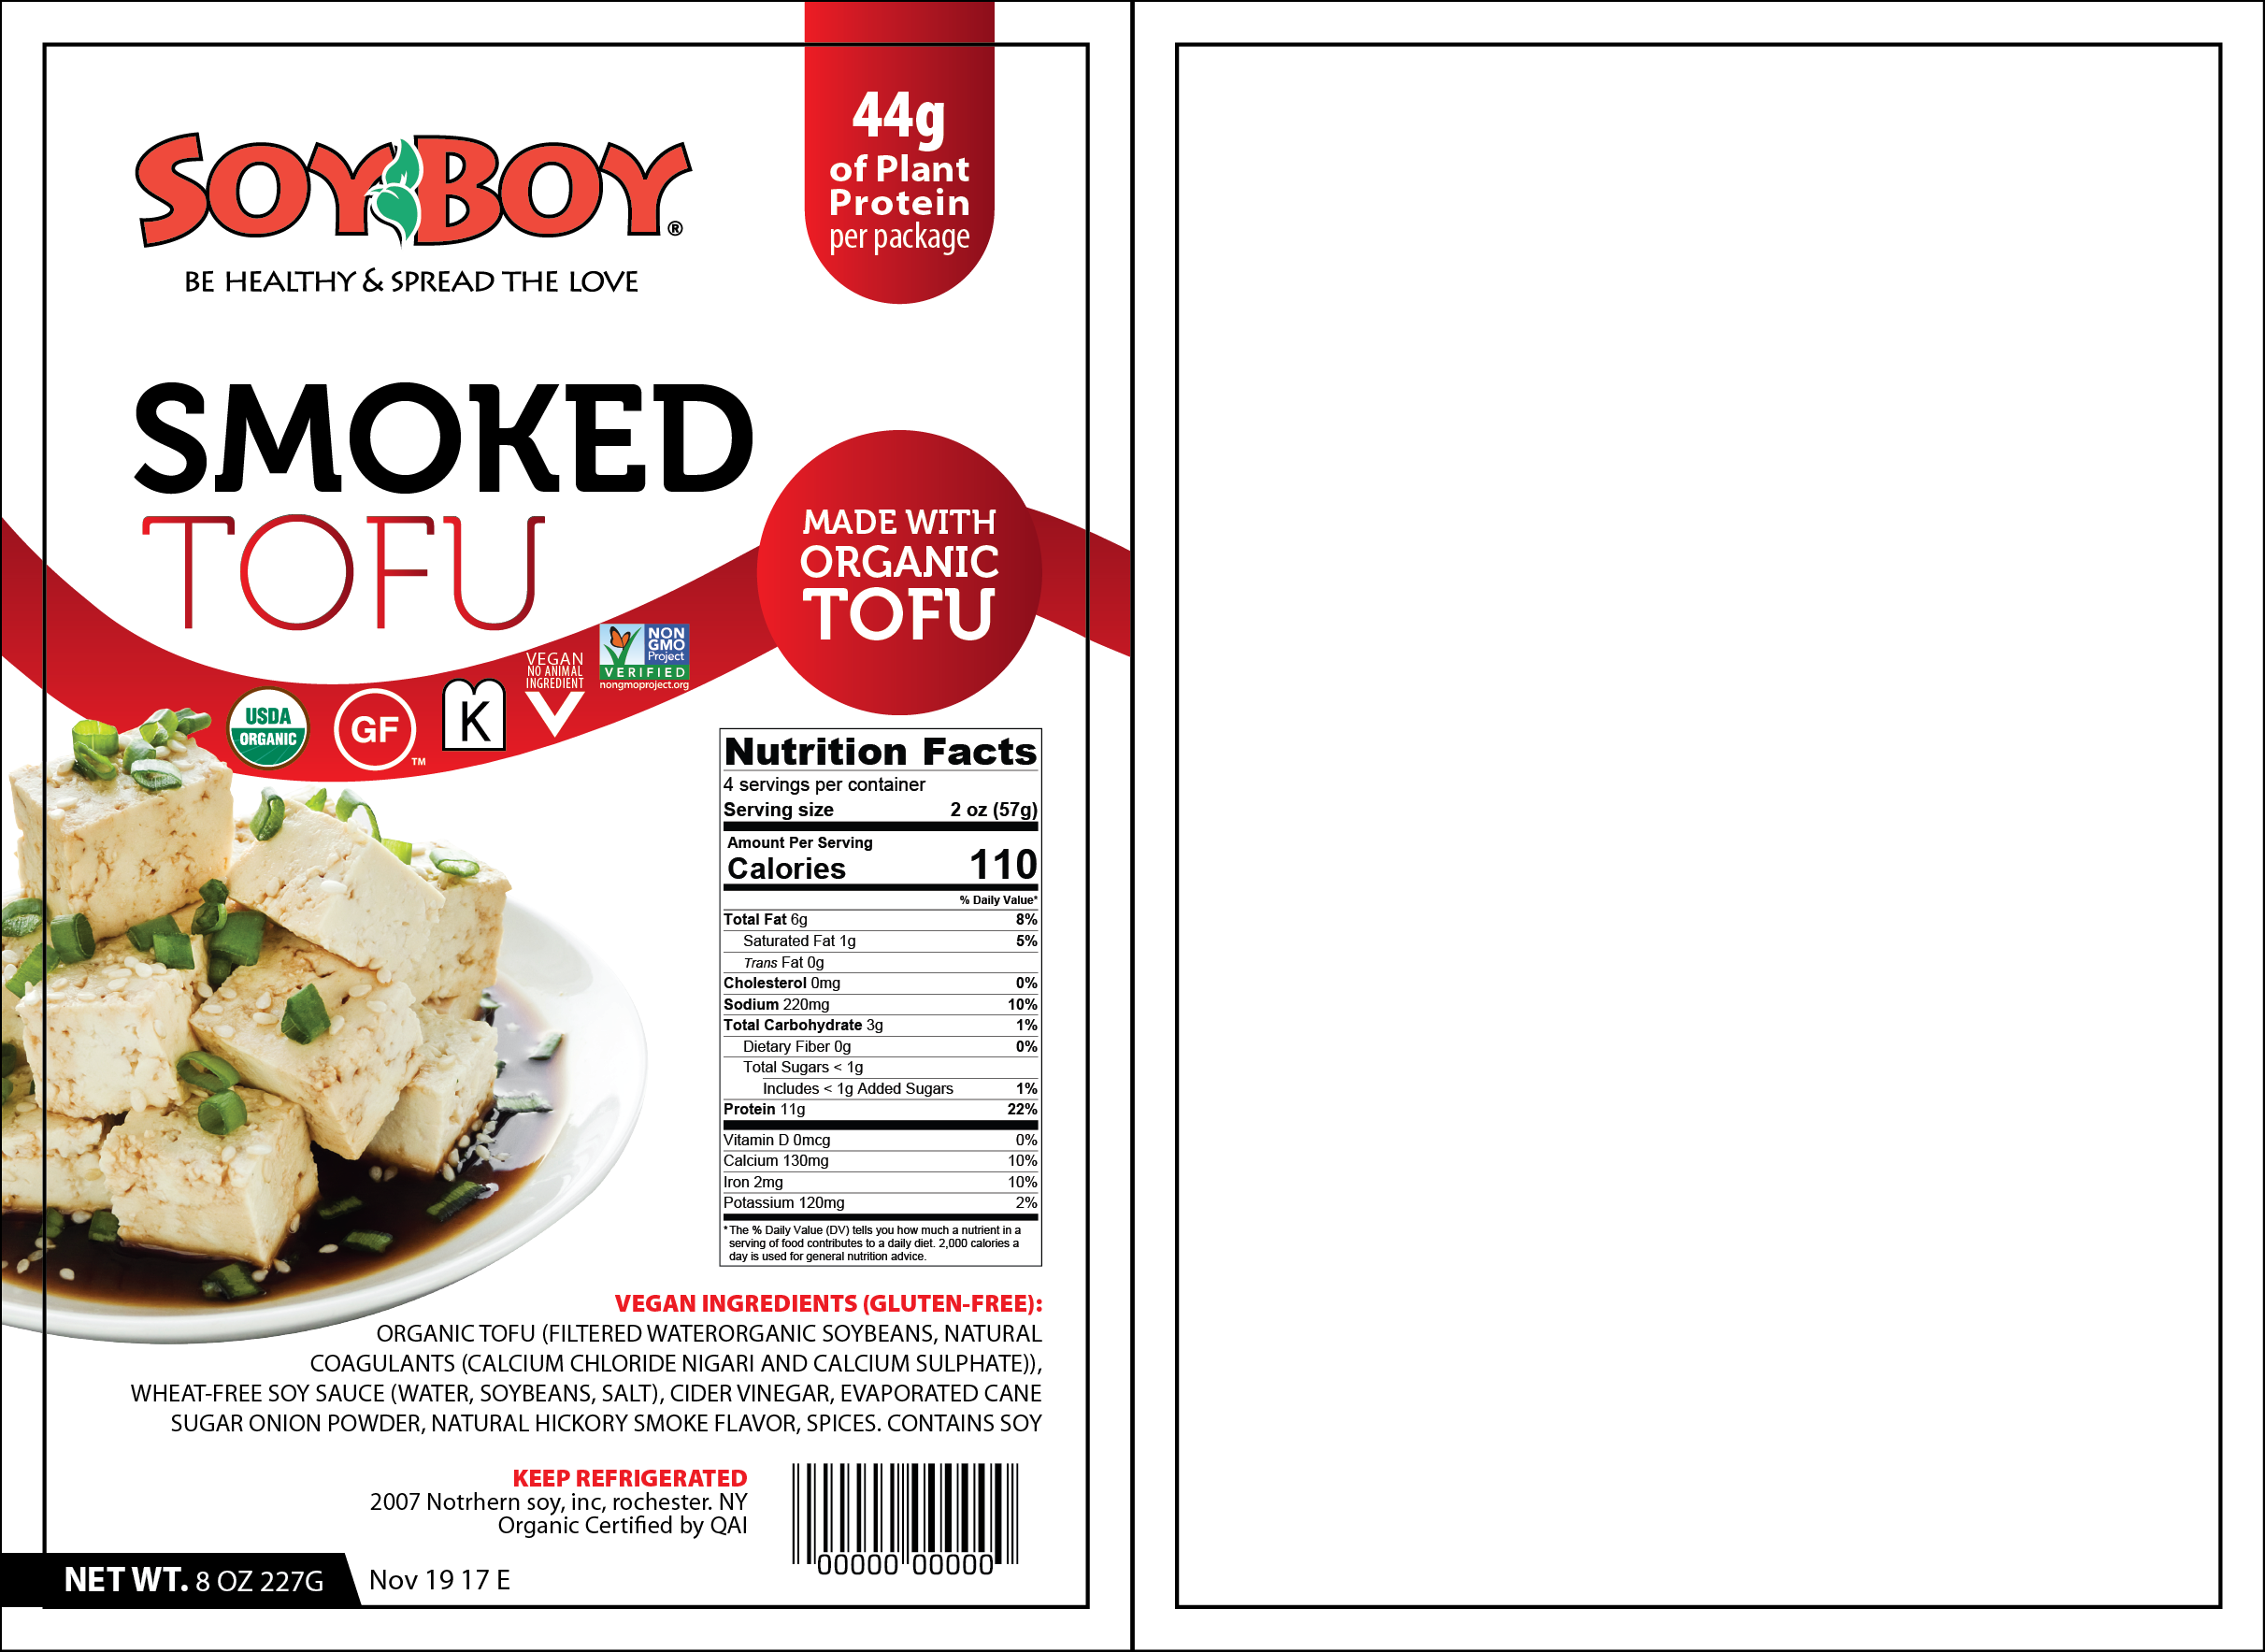 SoyBoy Tofu Label Refresh